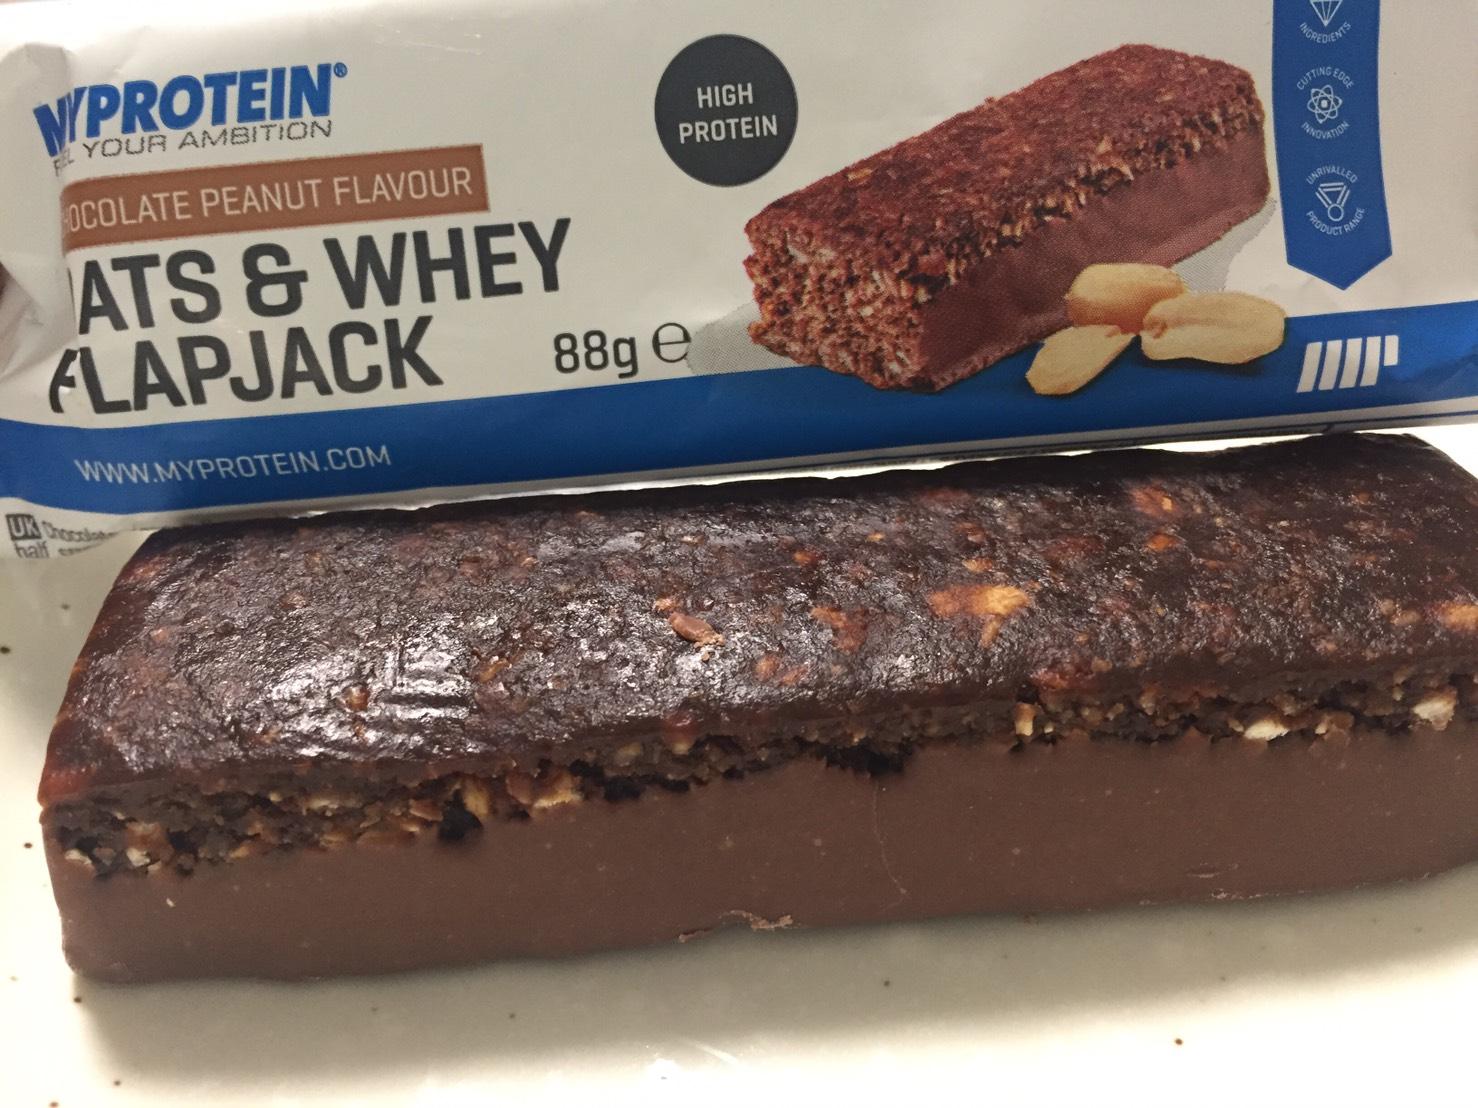 OATS & WHEY FLAPJACK(オーツ & ホエイ)「CHOCOLATE PEANUT FLAVOUR(チョコレートピーナッツ味)」を開封した様子